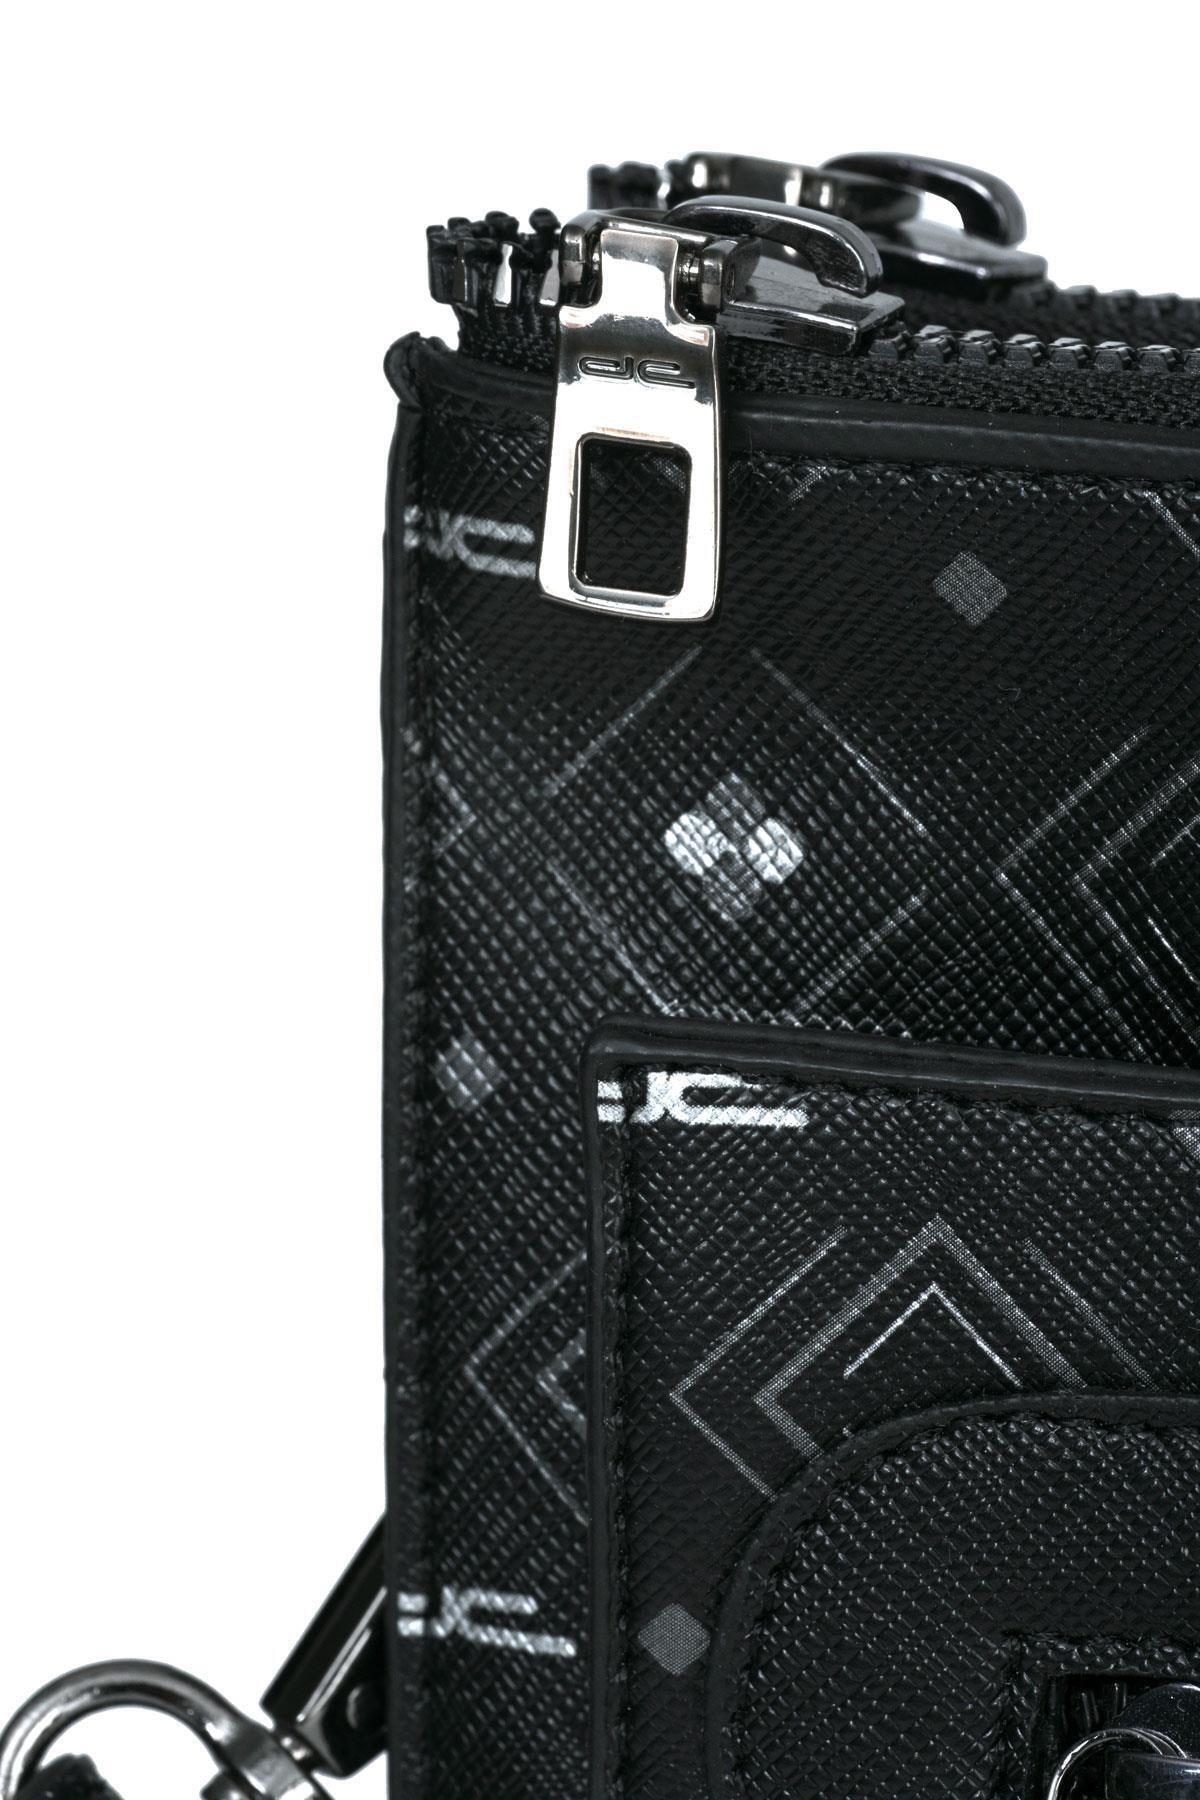 Deri Company Kadın Siyah Gri Çanta 2